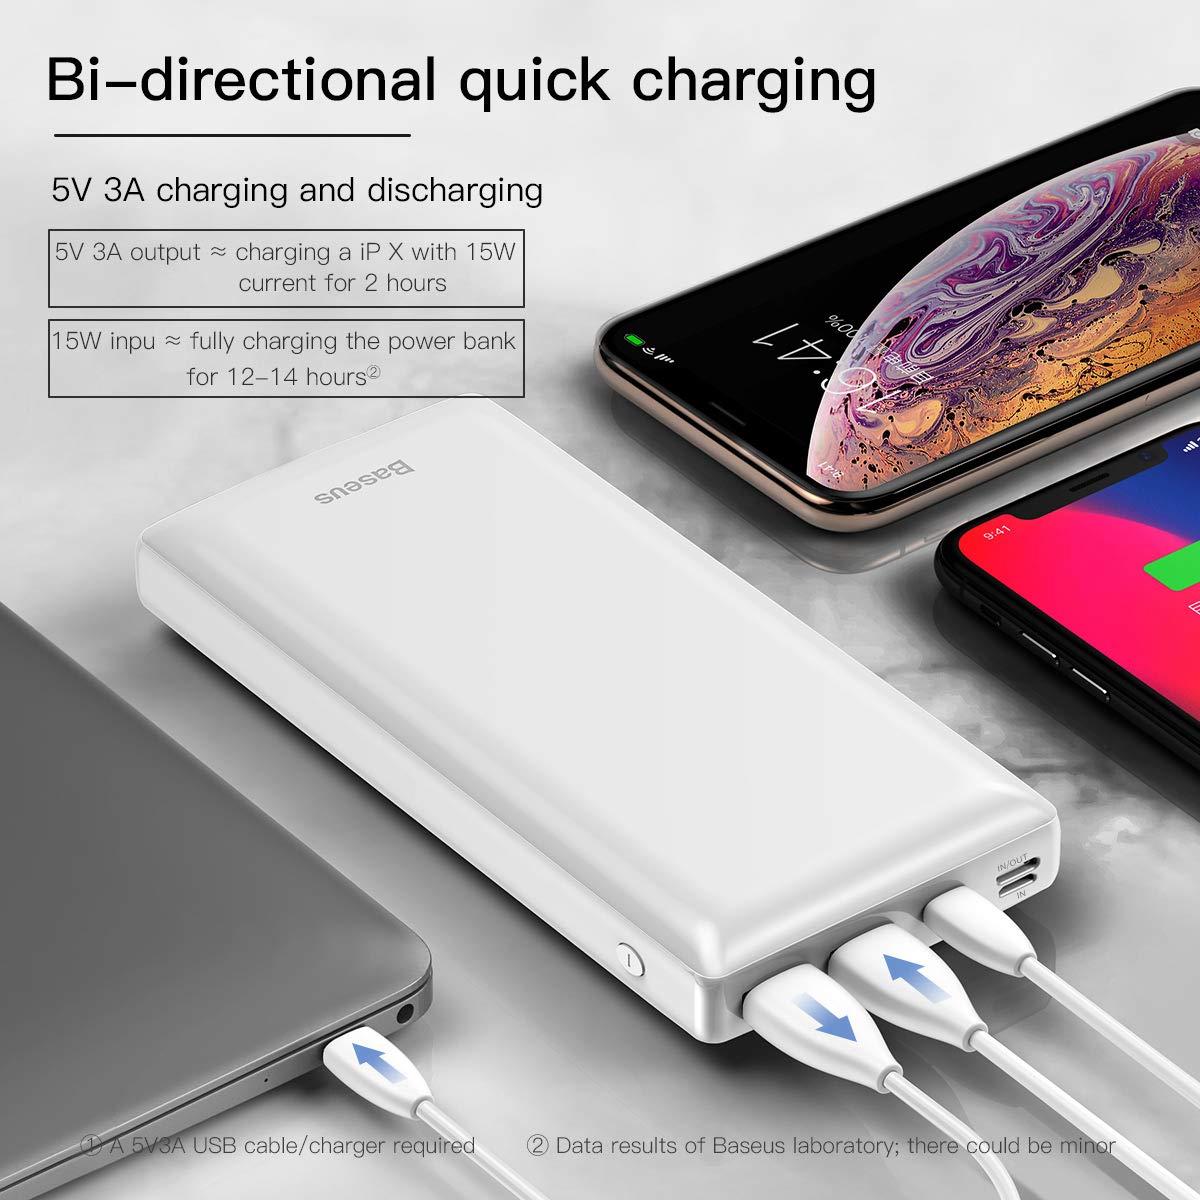 Baseus Power Bank Cargador port/átil 30000 mAh, USB C, PD, Carga r/ápida para iPhone, iPad, Mac, Samsung, Huawei y m/ás Color Negro